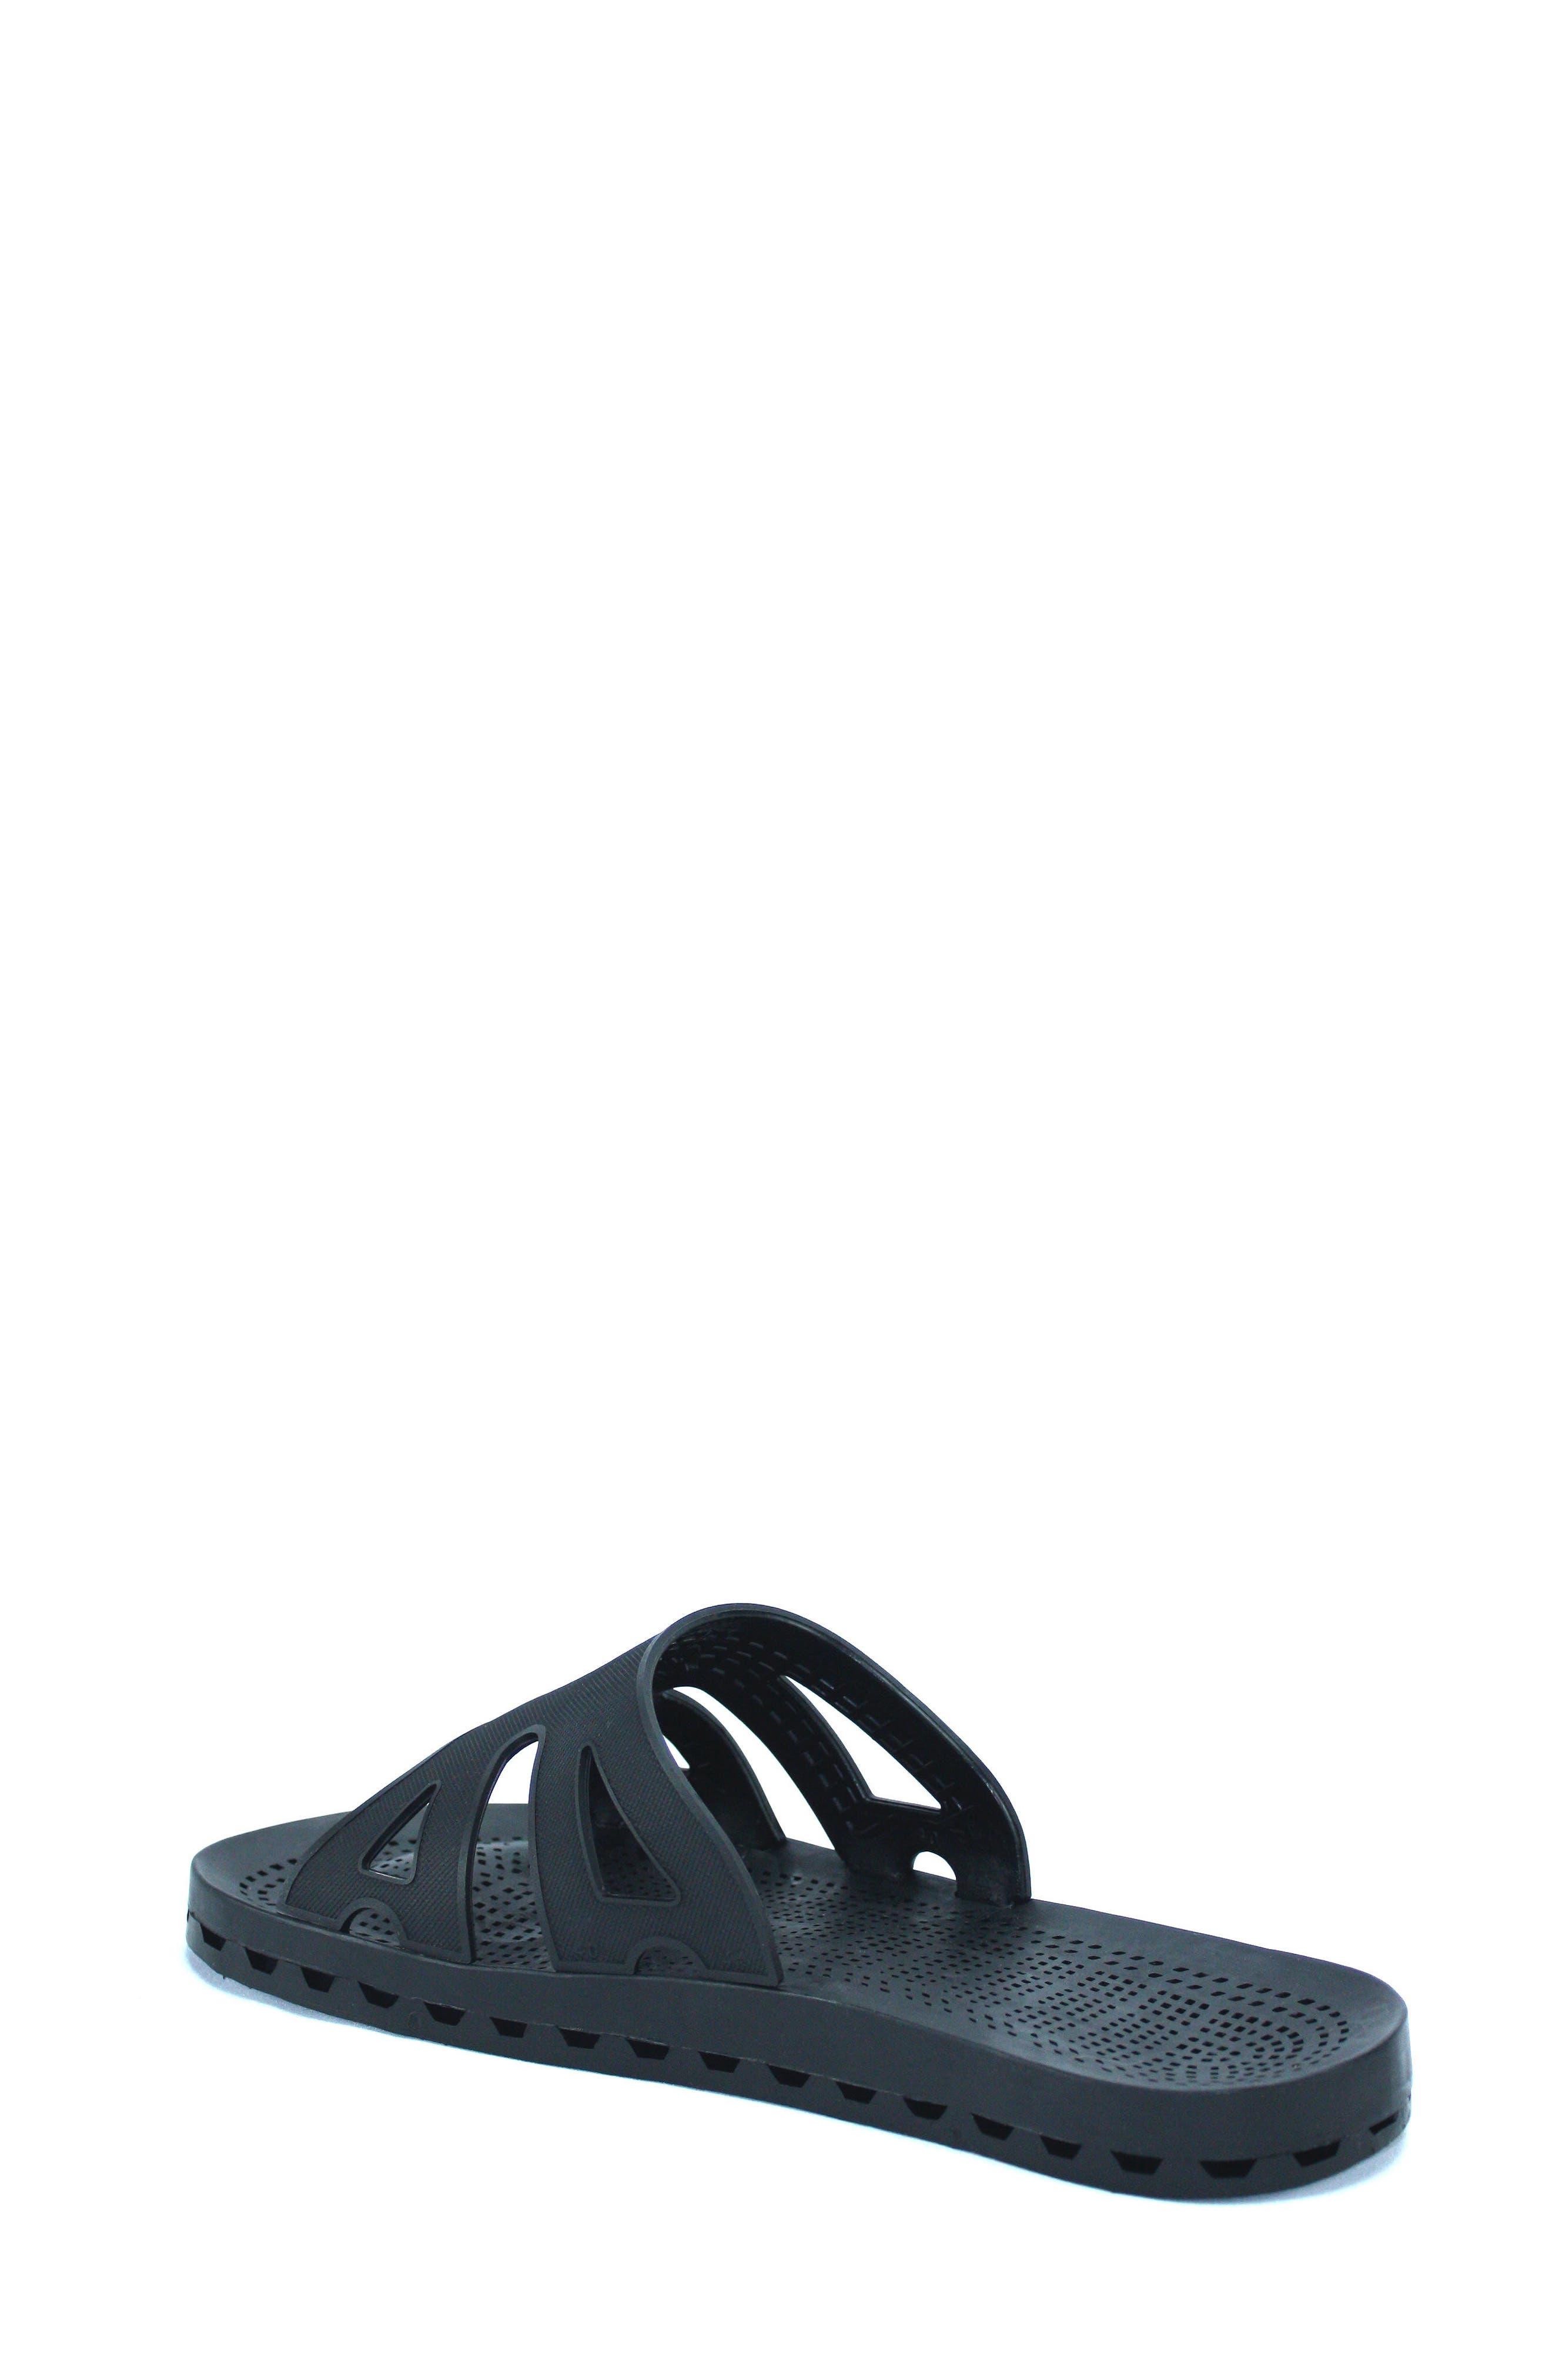 Regatta Slide Sandal,                             Alternate thumbnail 2, color,                             Solid Black Rubber